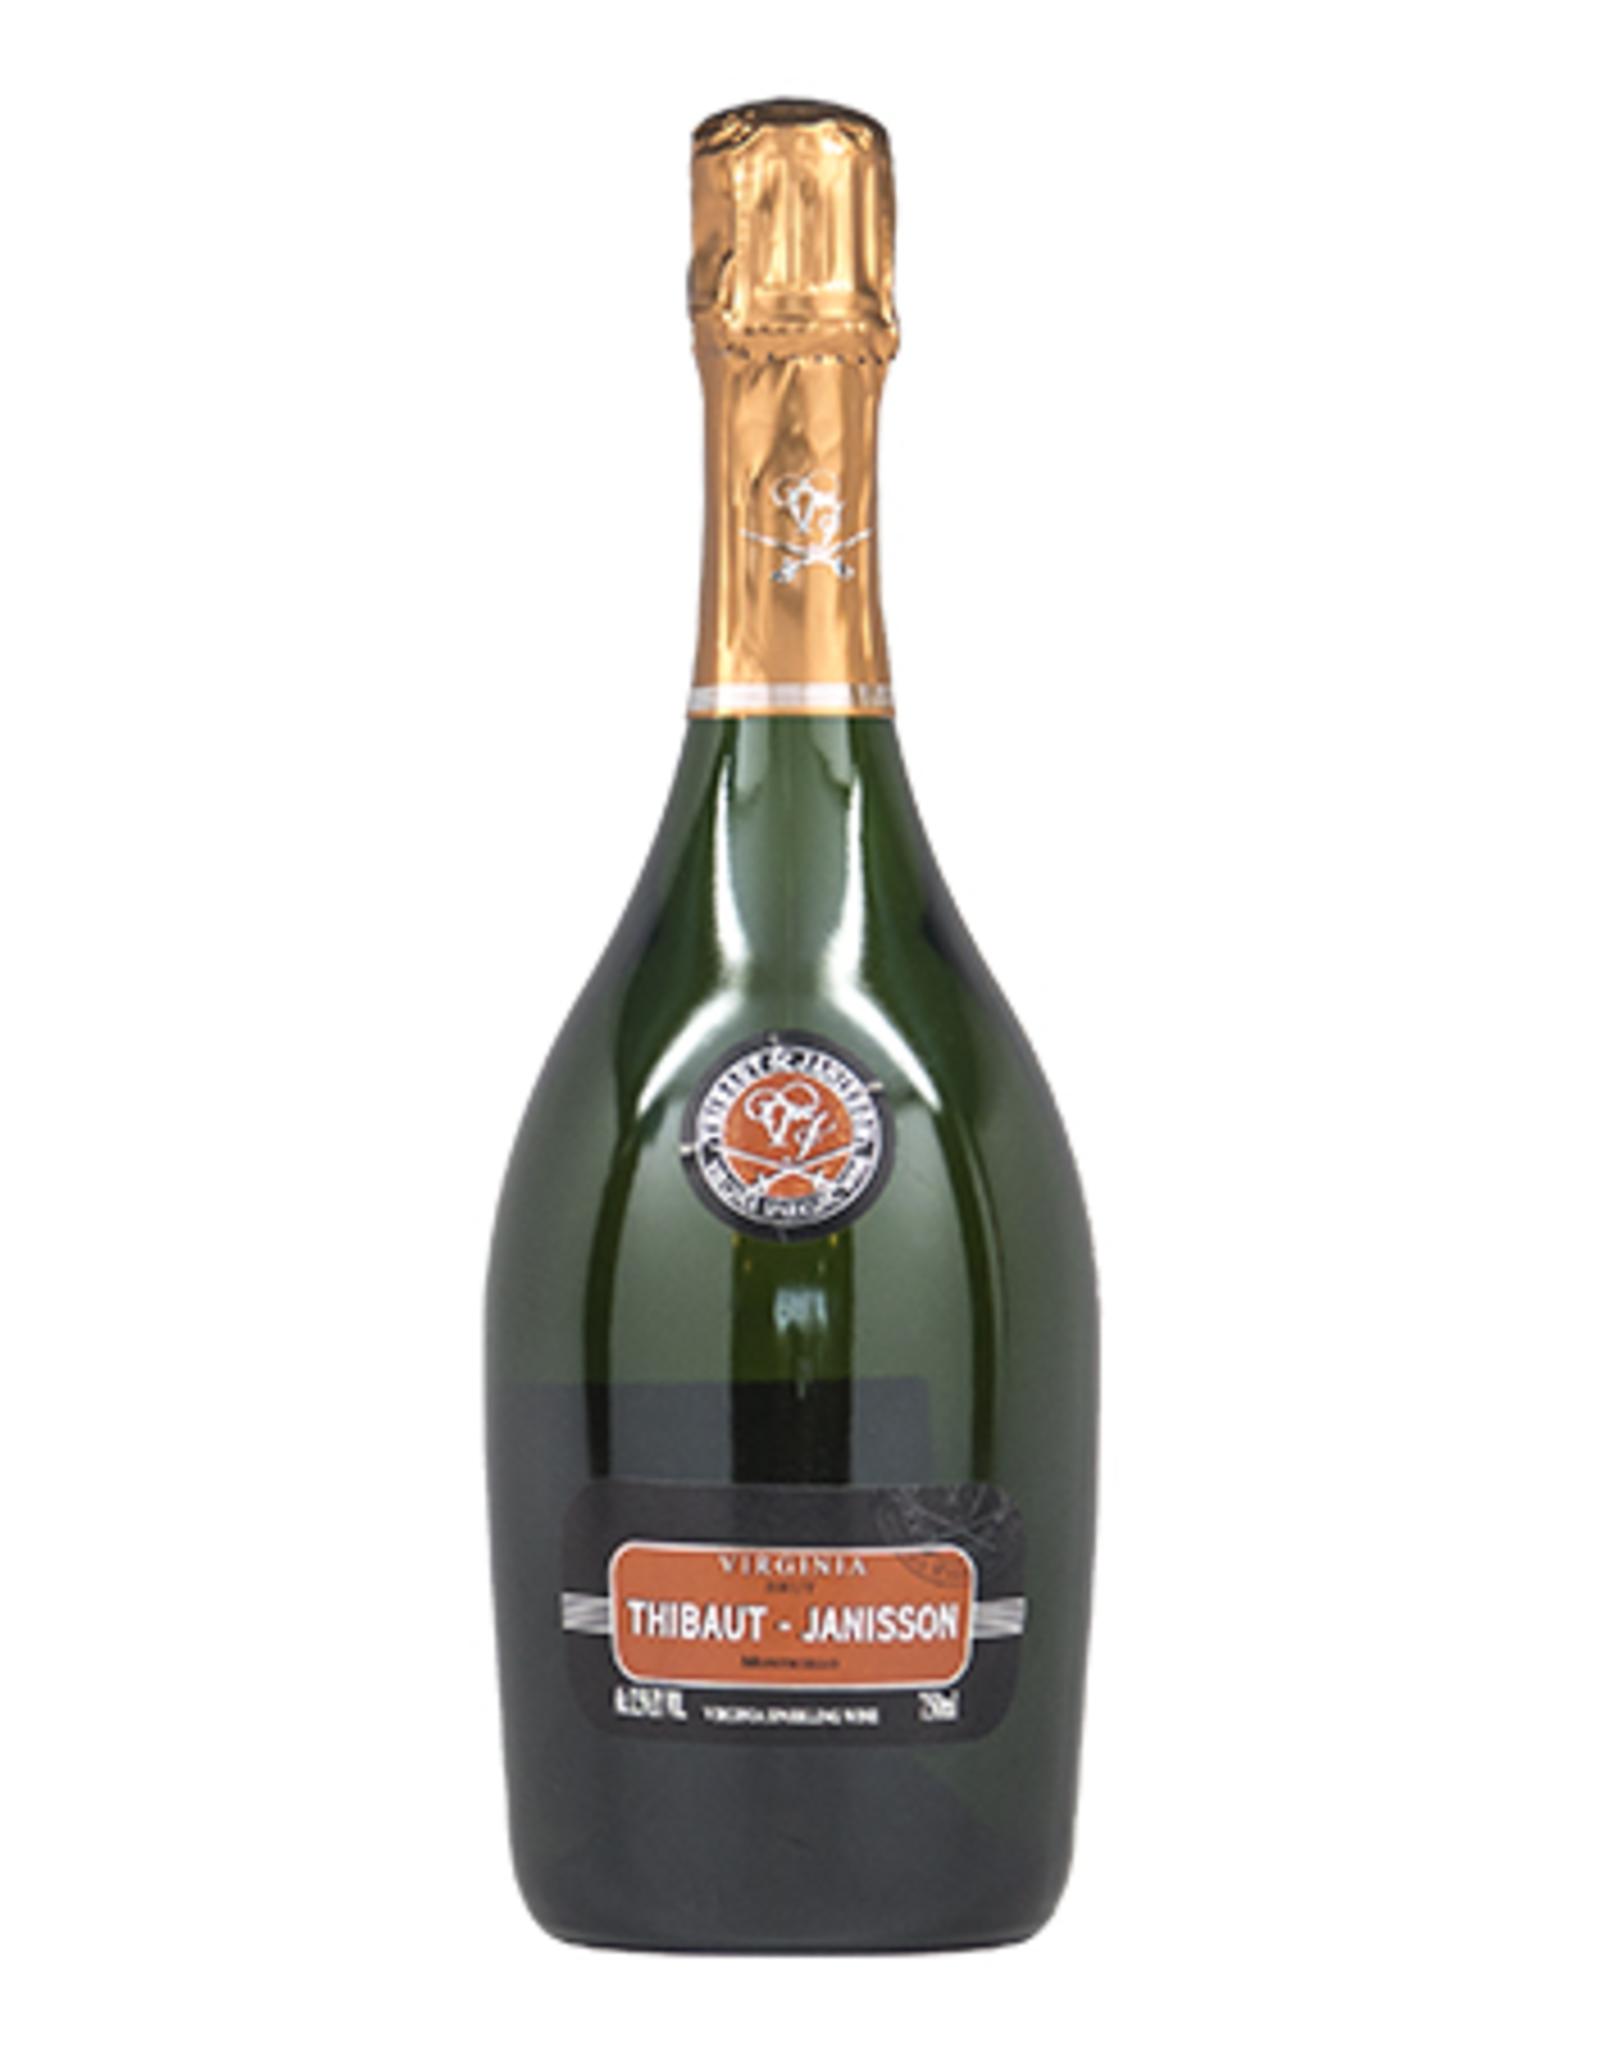 Thibault-Janisson Thibaut-Janisson Blanc de Chardonnay Brut NV